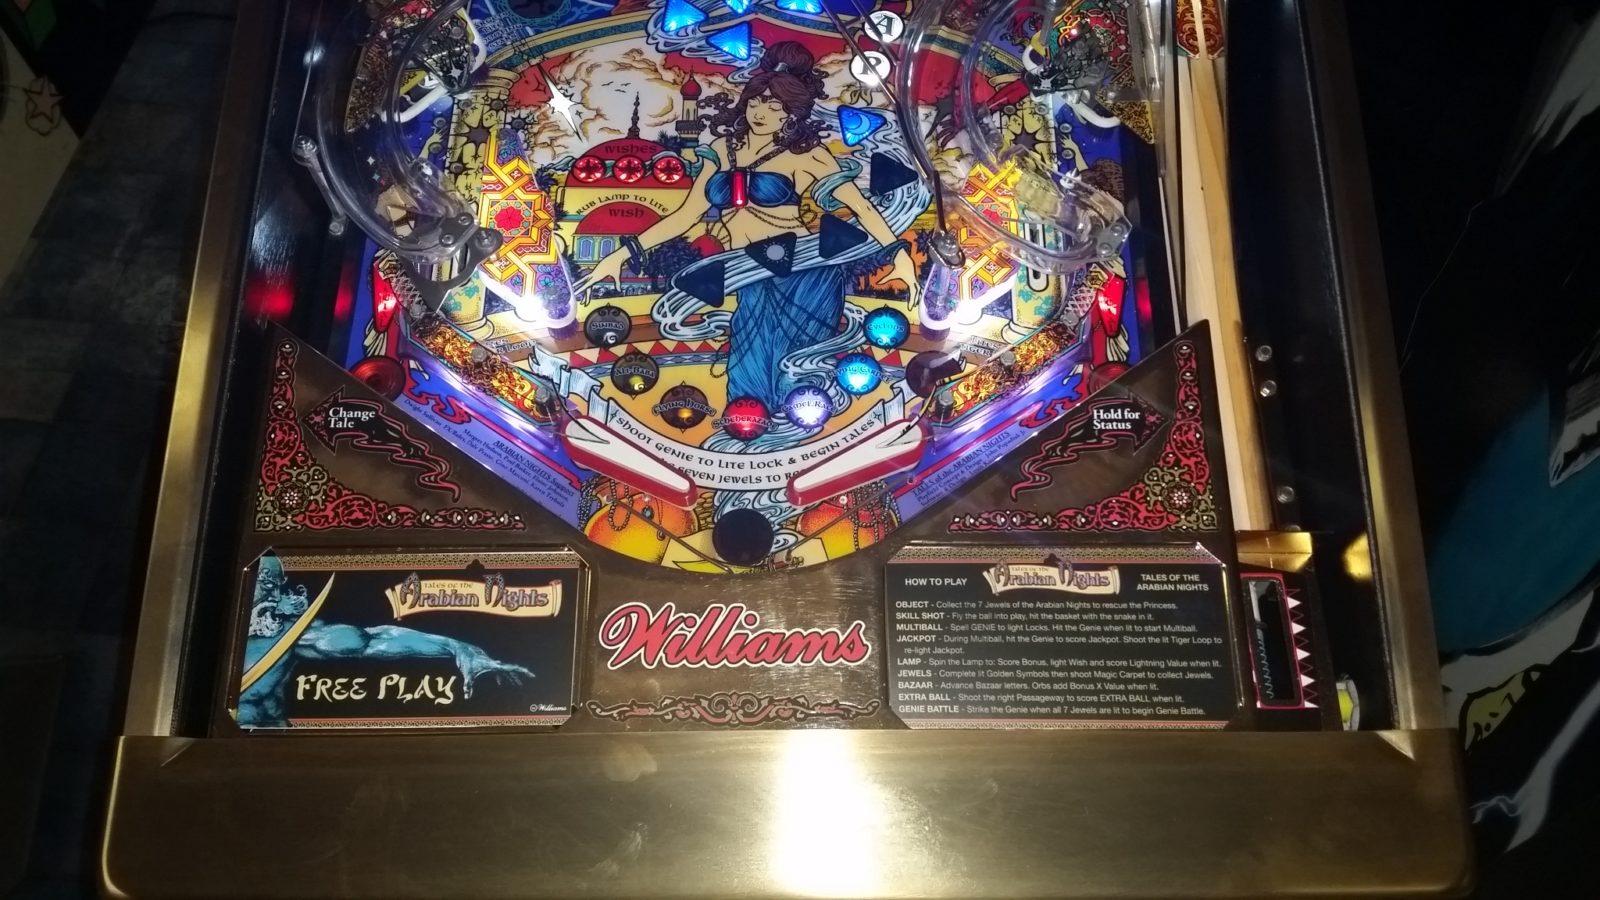 Arcade Classics - Arcade Classics Australia - Arcade Machines and